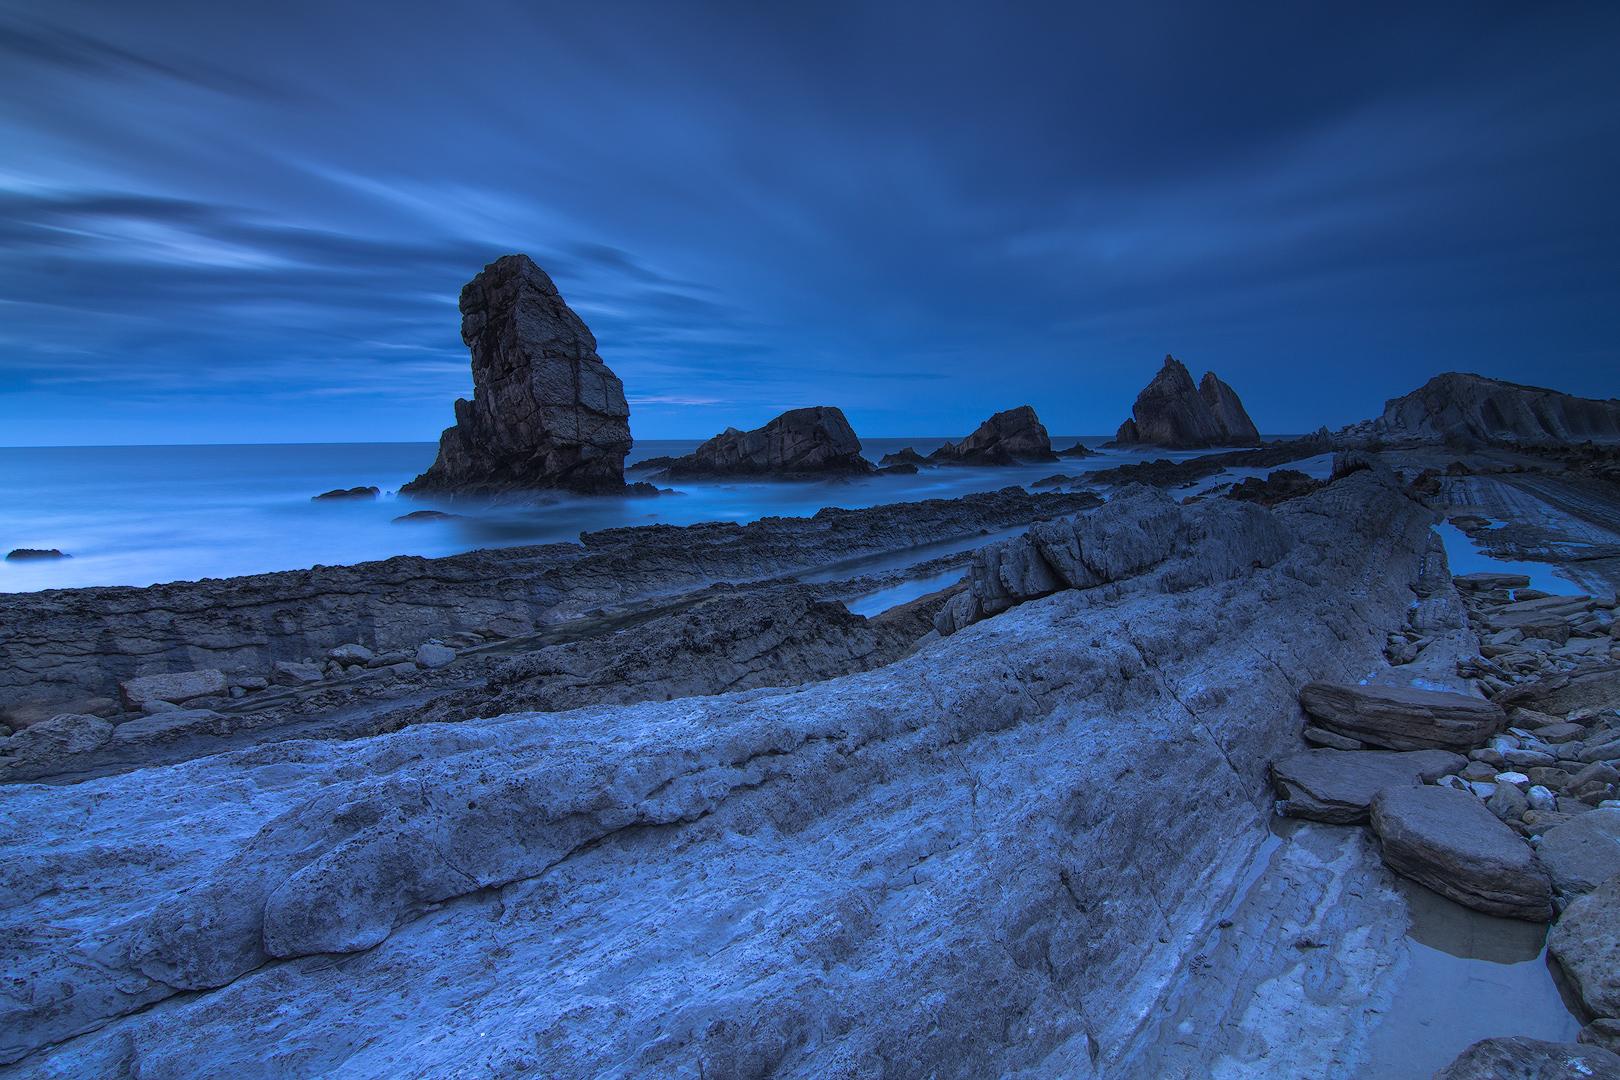 Blue Arnia